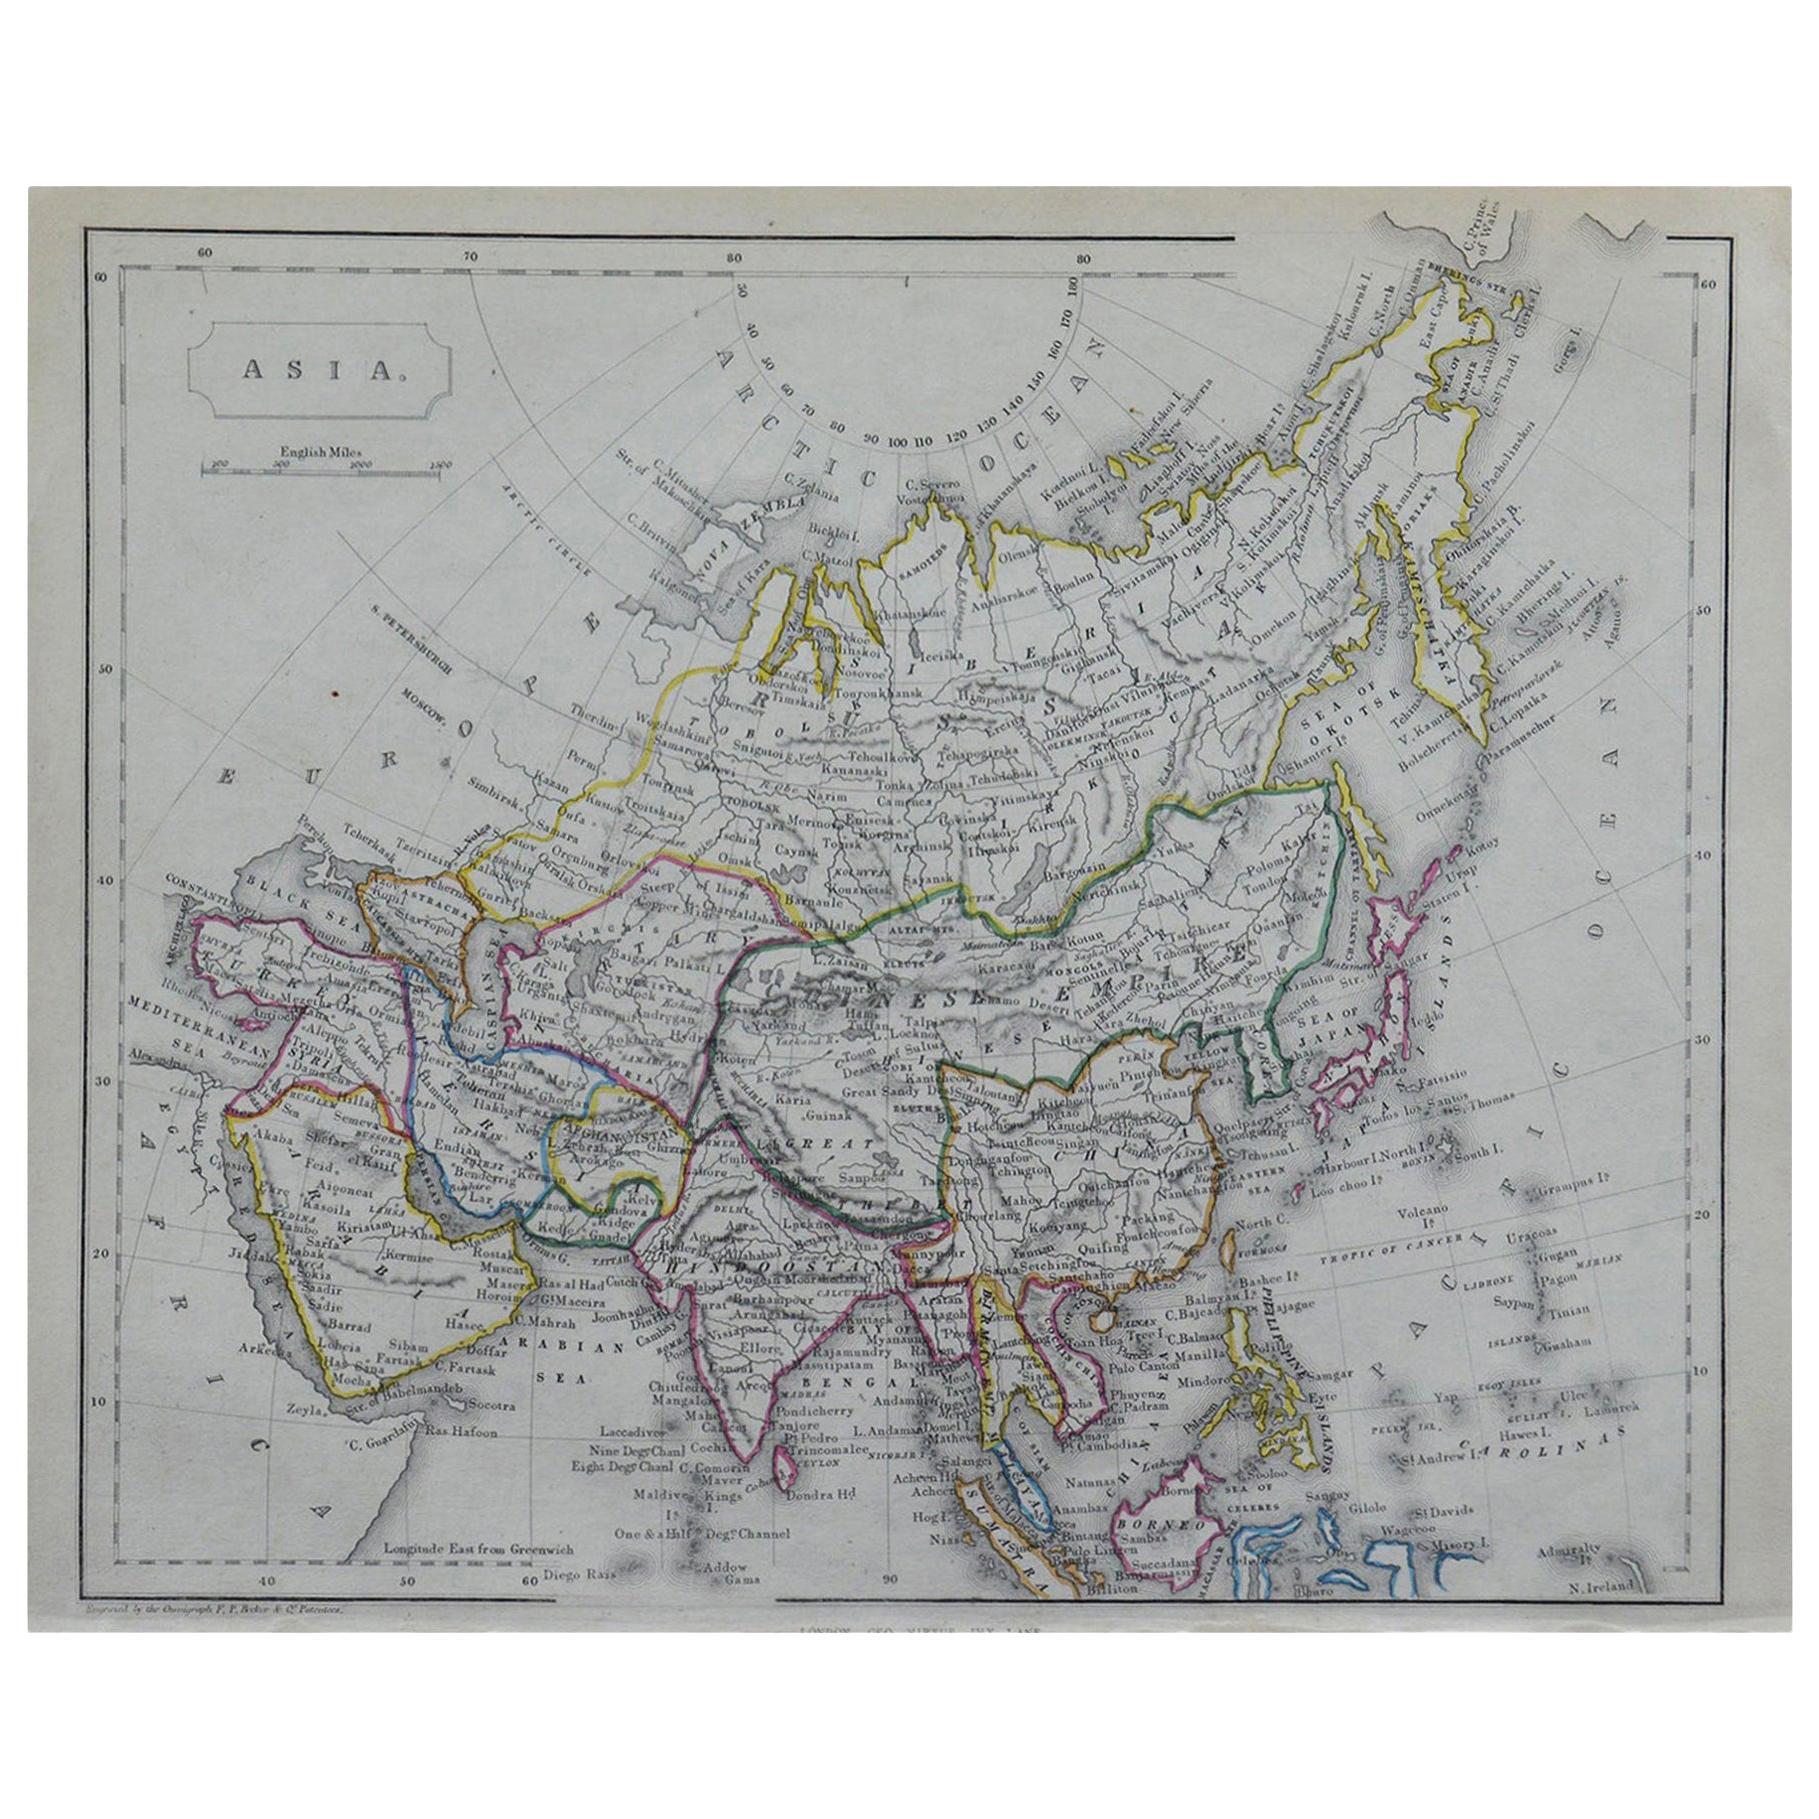 Original Antique Map of Asia by Becker, circa 1840